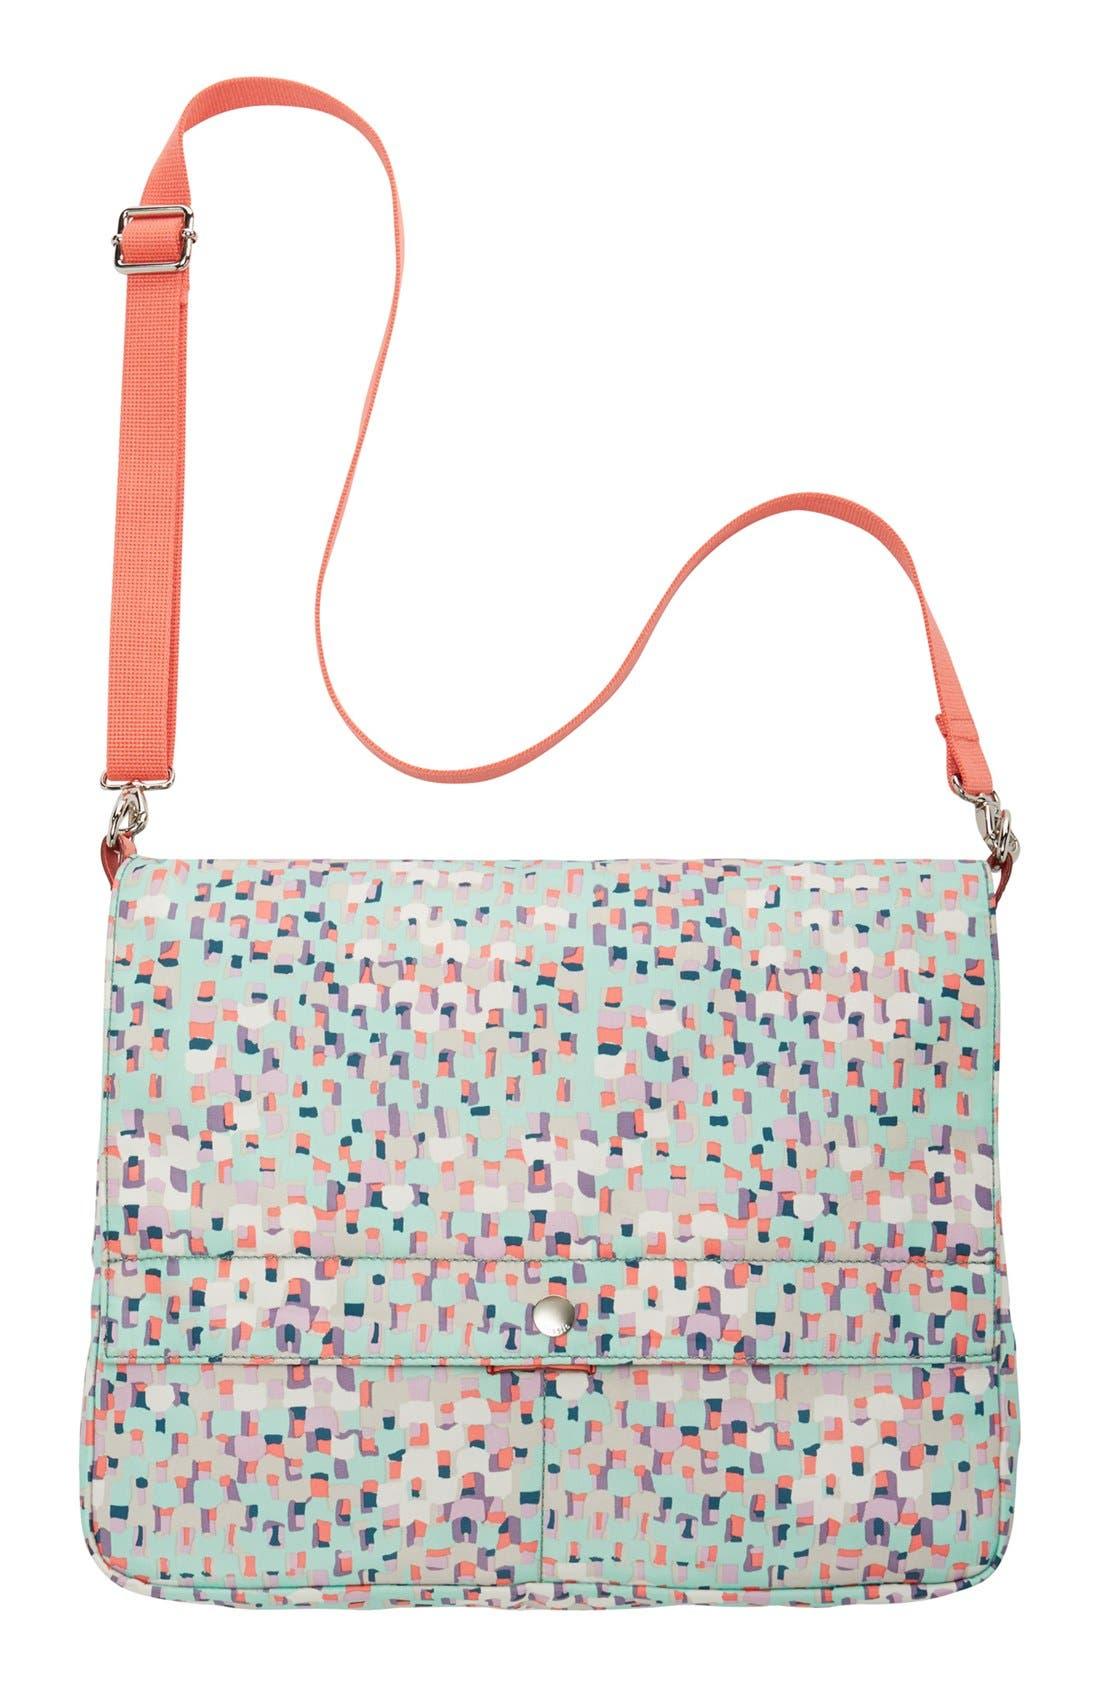 FOSSIL,                             'Key-Per' Messenger Bag,                             Alternate thumbnail 2, color,                             403